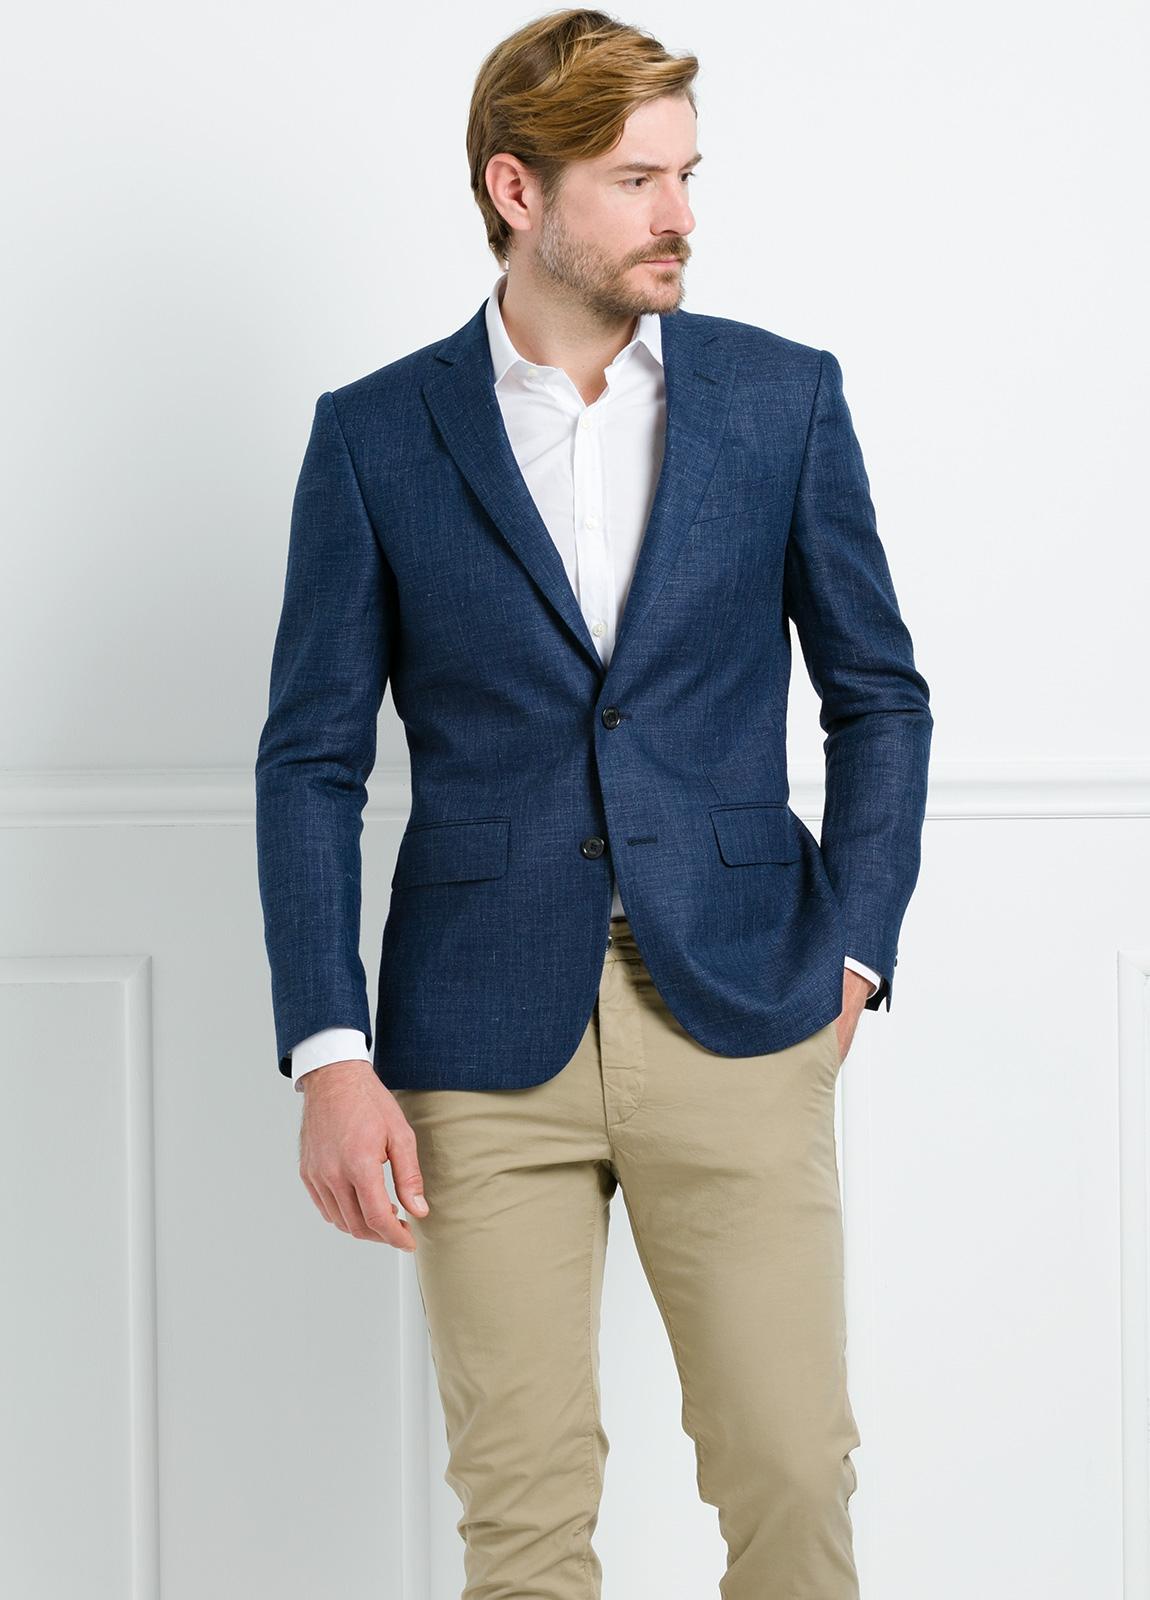 Americana Slim Fit color azul marino. 55% Lino 45% Lana.